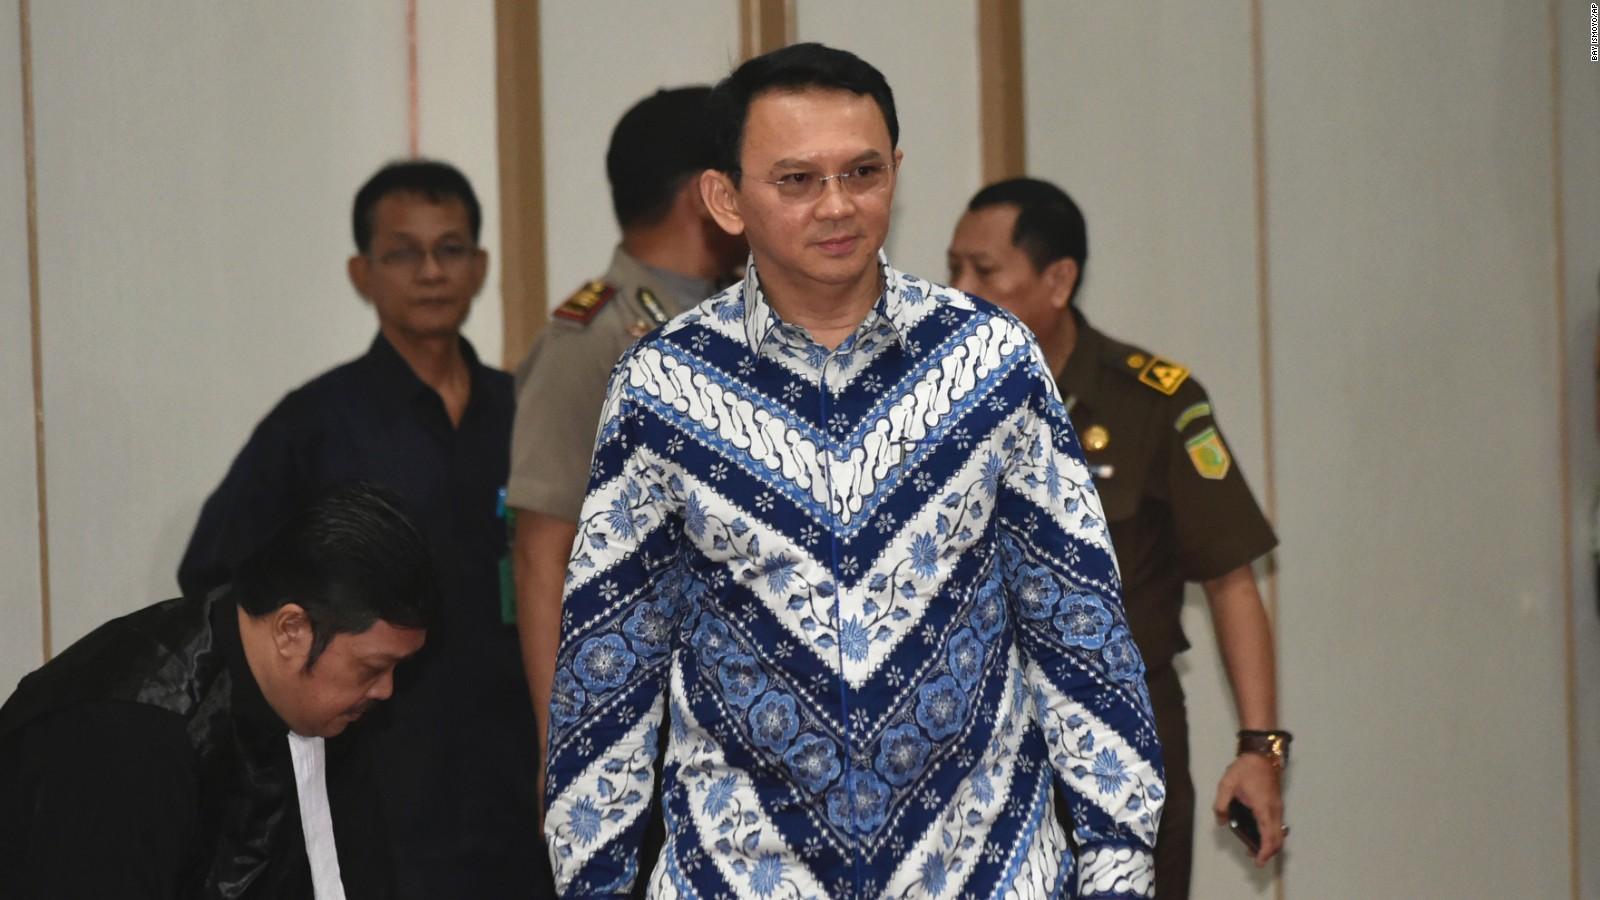 Ahok guilty jakartan governor sentenced to jail after landmark ahok guilty jakartan governor sentenced to jail after landmark indonesian blasphemy trial cnn stopboris Gallery